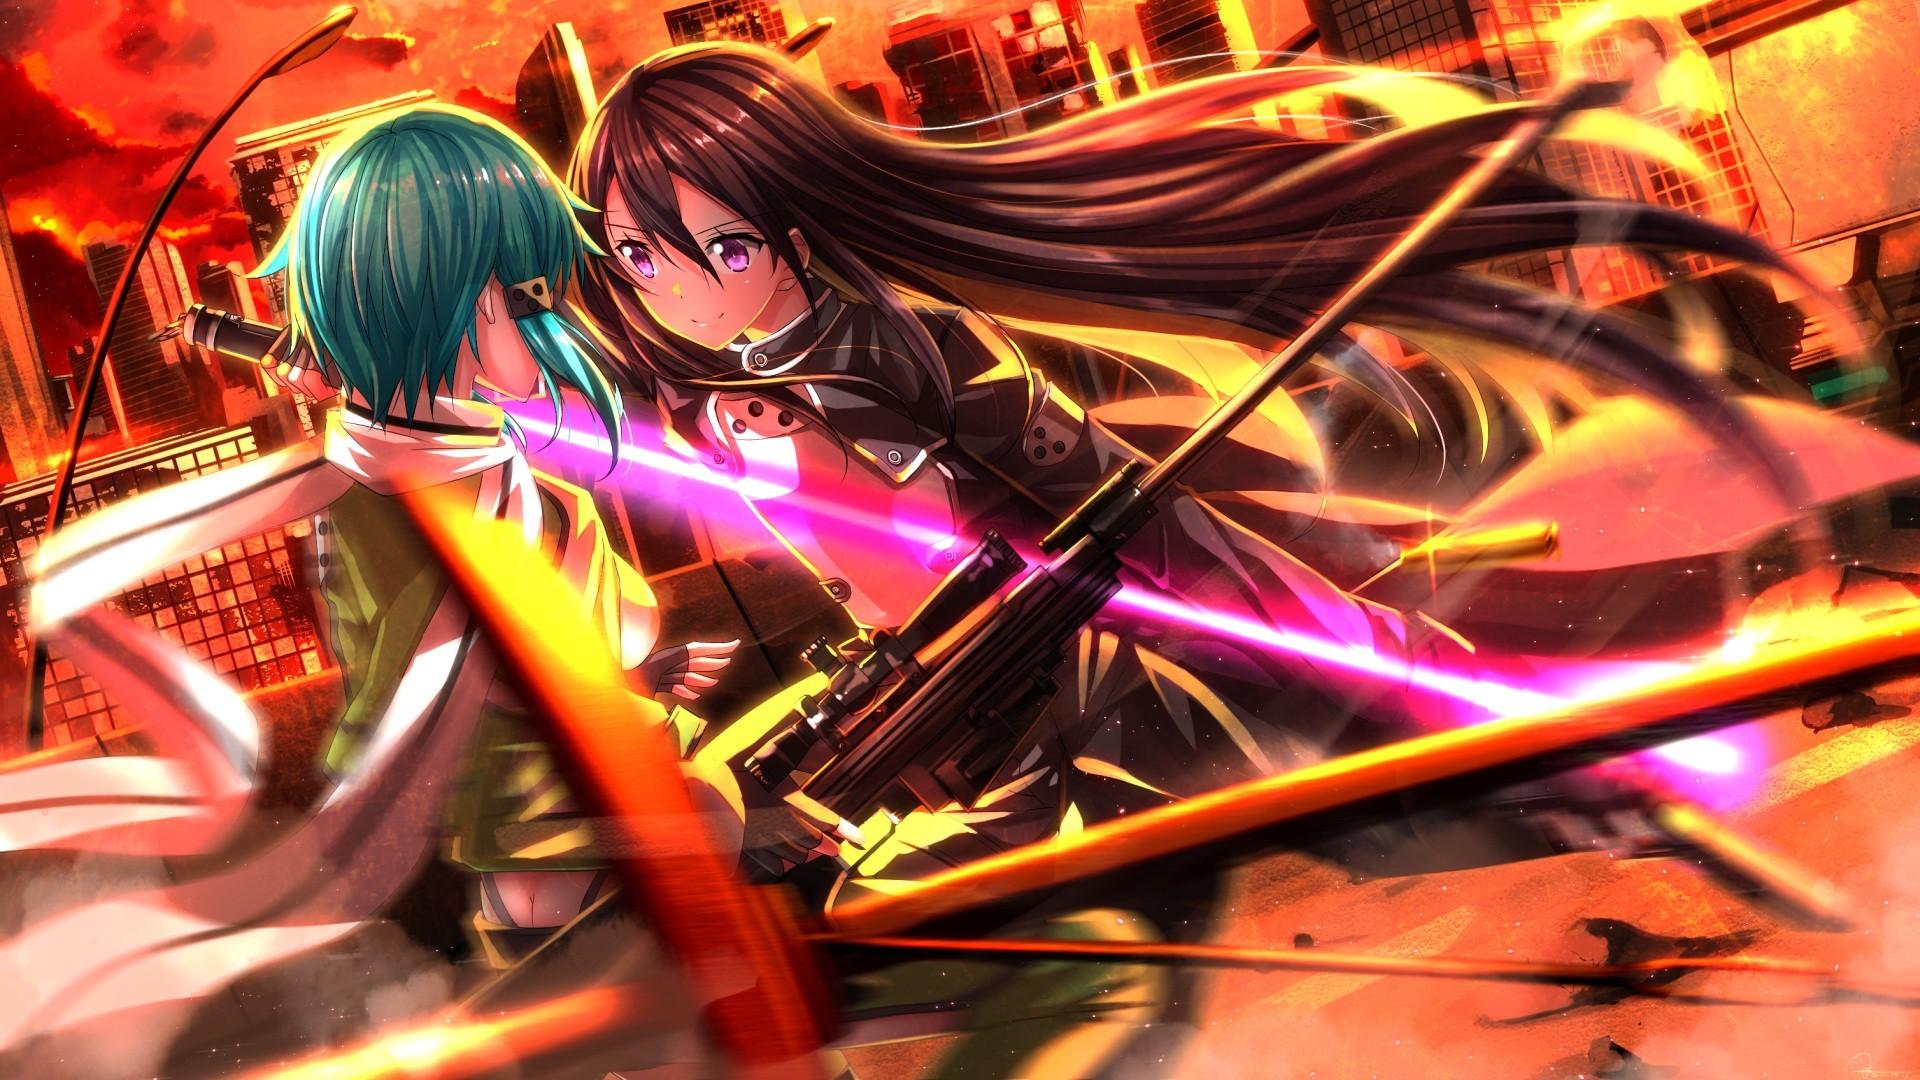 Anime Girls Sword Art Online Kirigaya Kazuto Asada Shino Swordsouls Gun Gale Games Screenshot